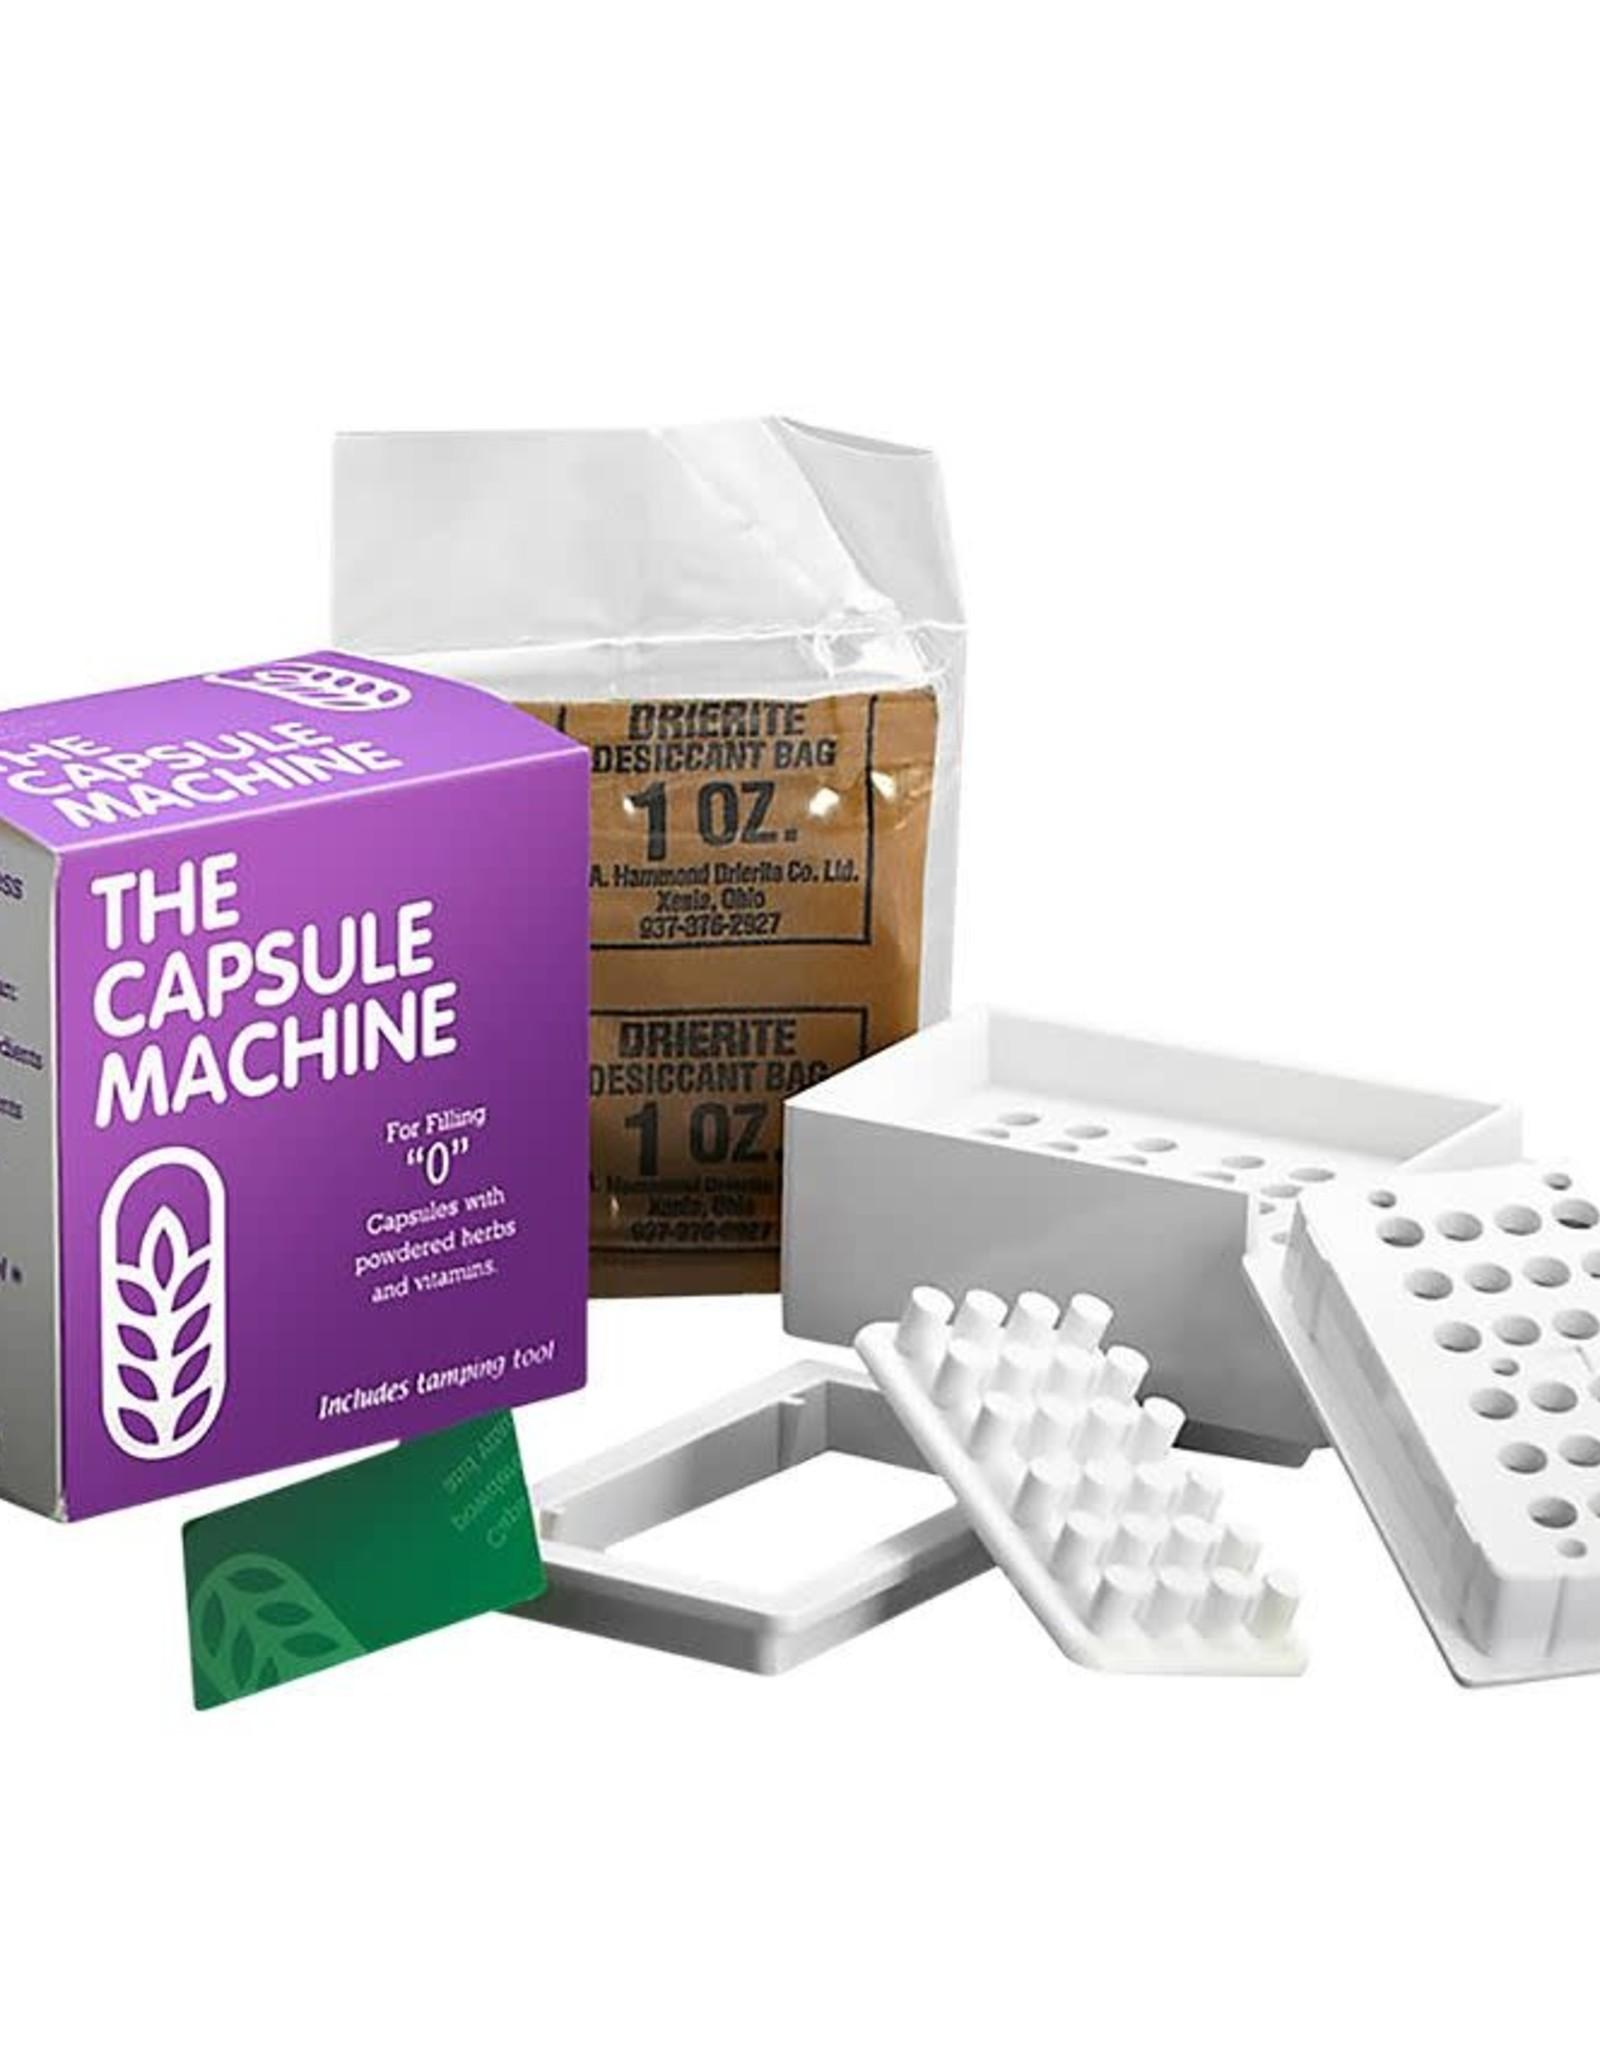 The Capsule Machine The Capsule Machine